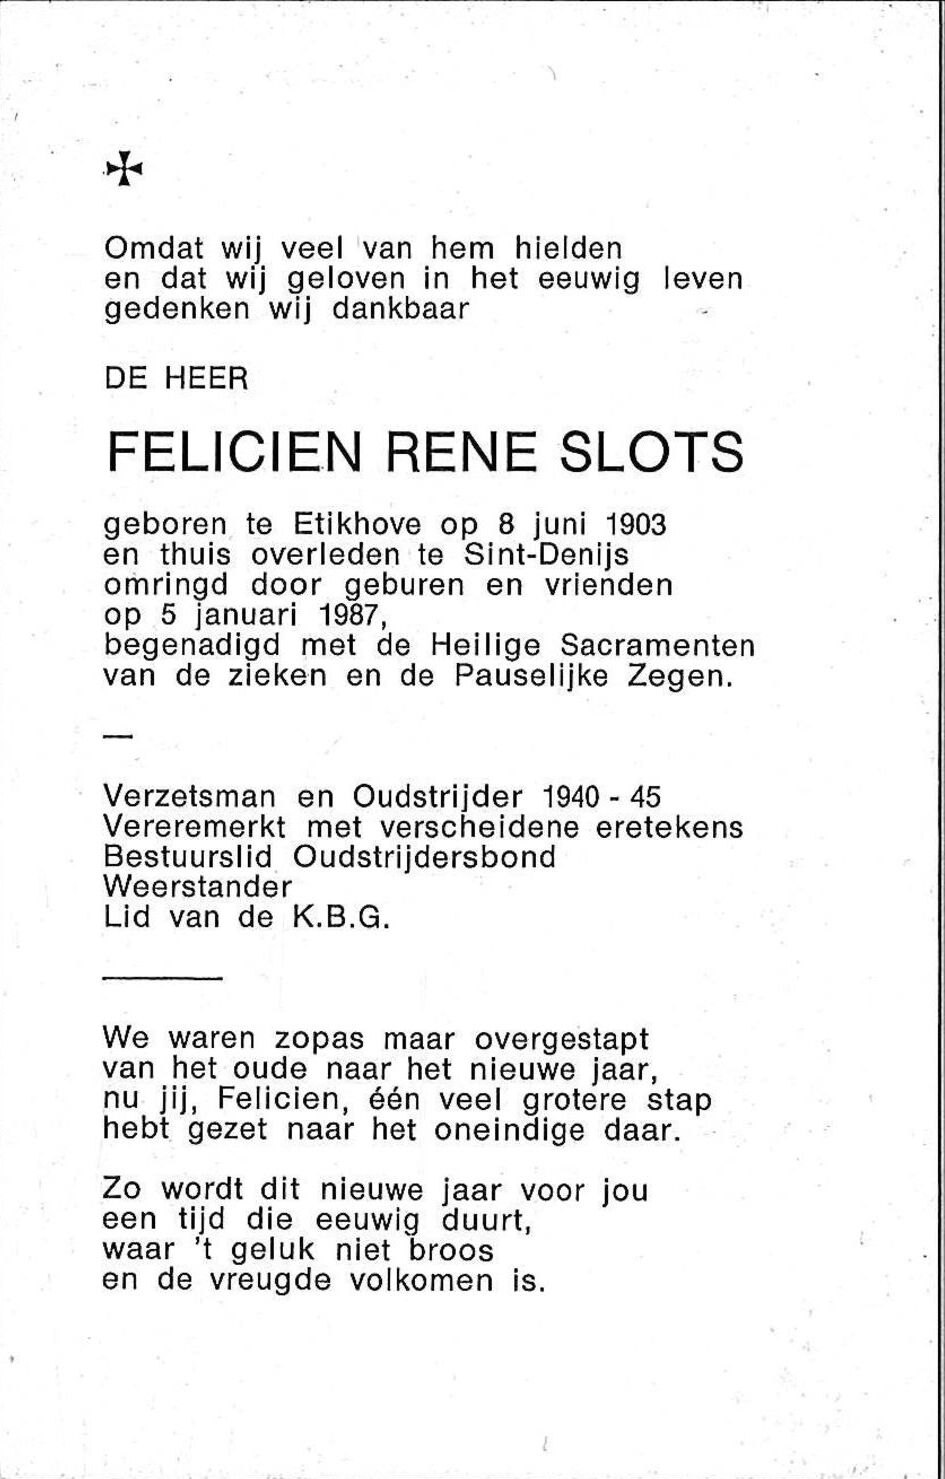 Slots Felicien